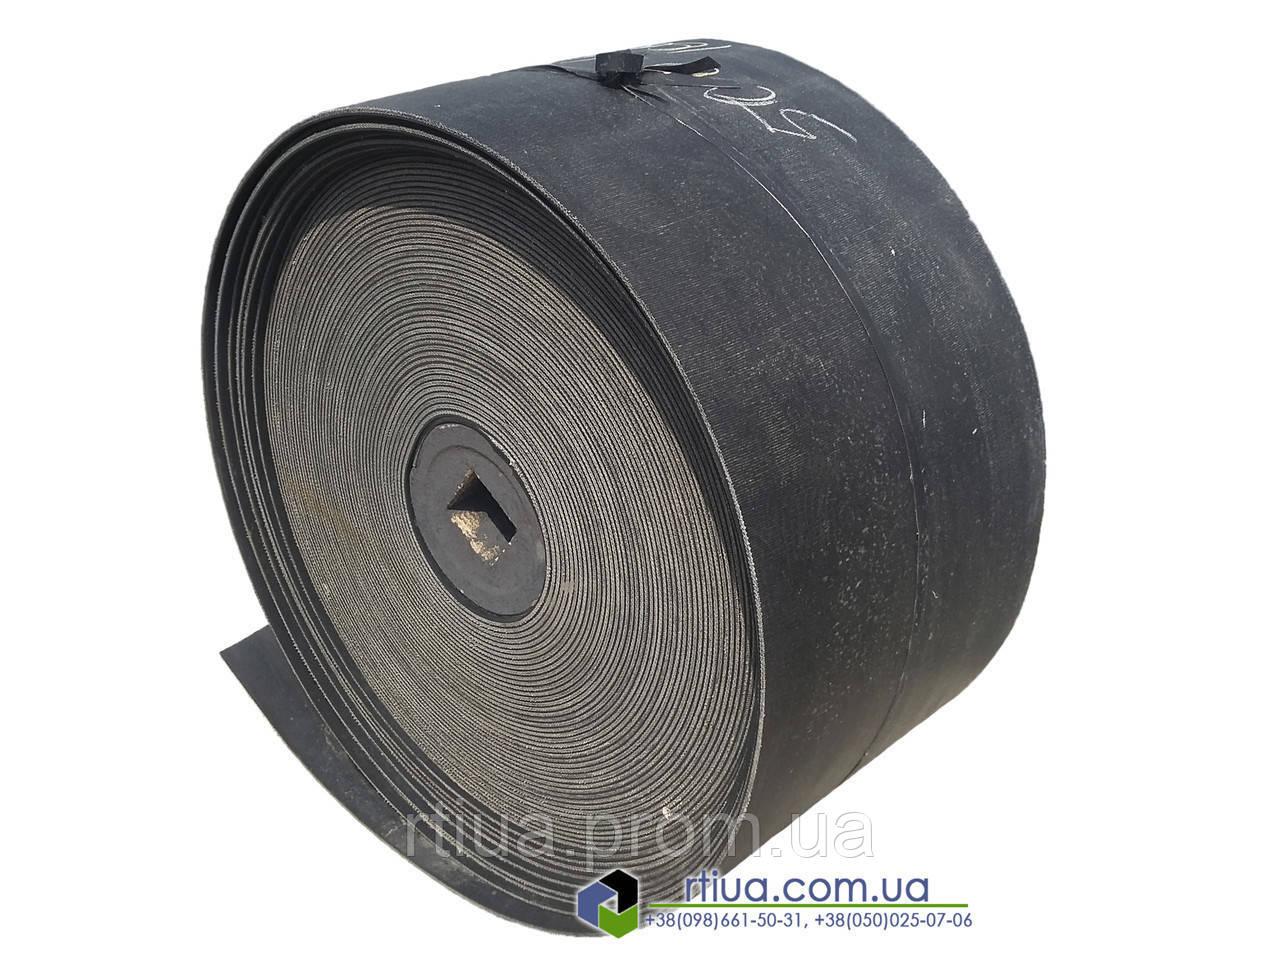 Конвейерная лента 150х5 мм